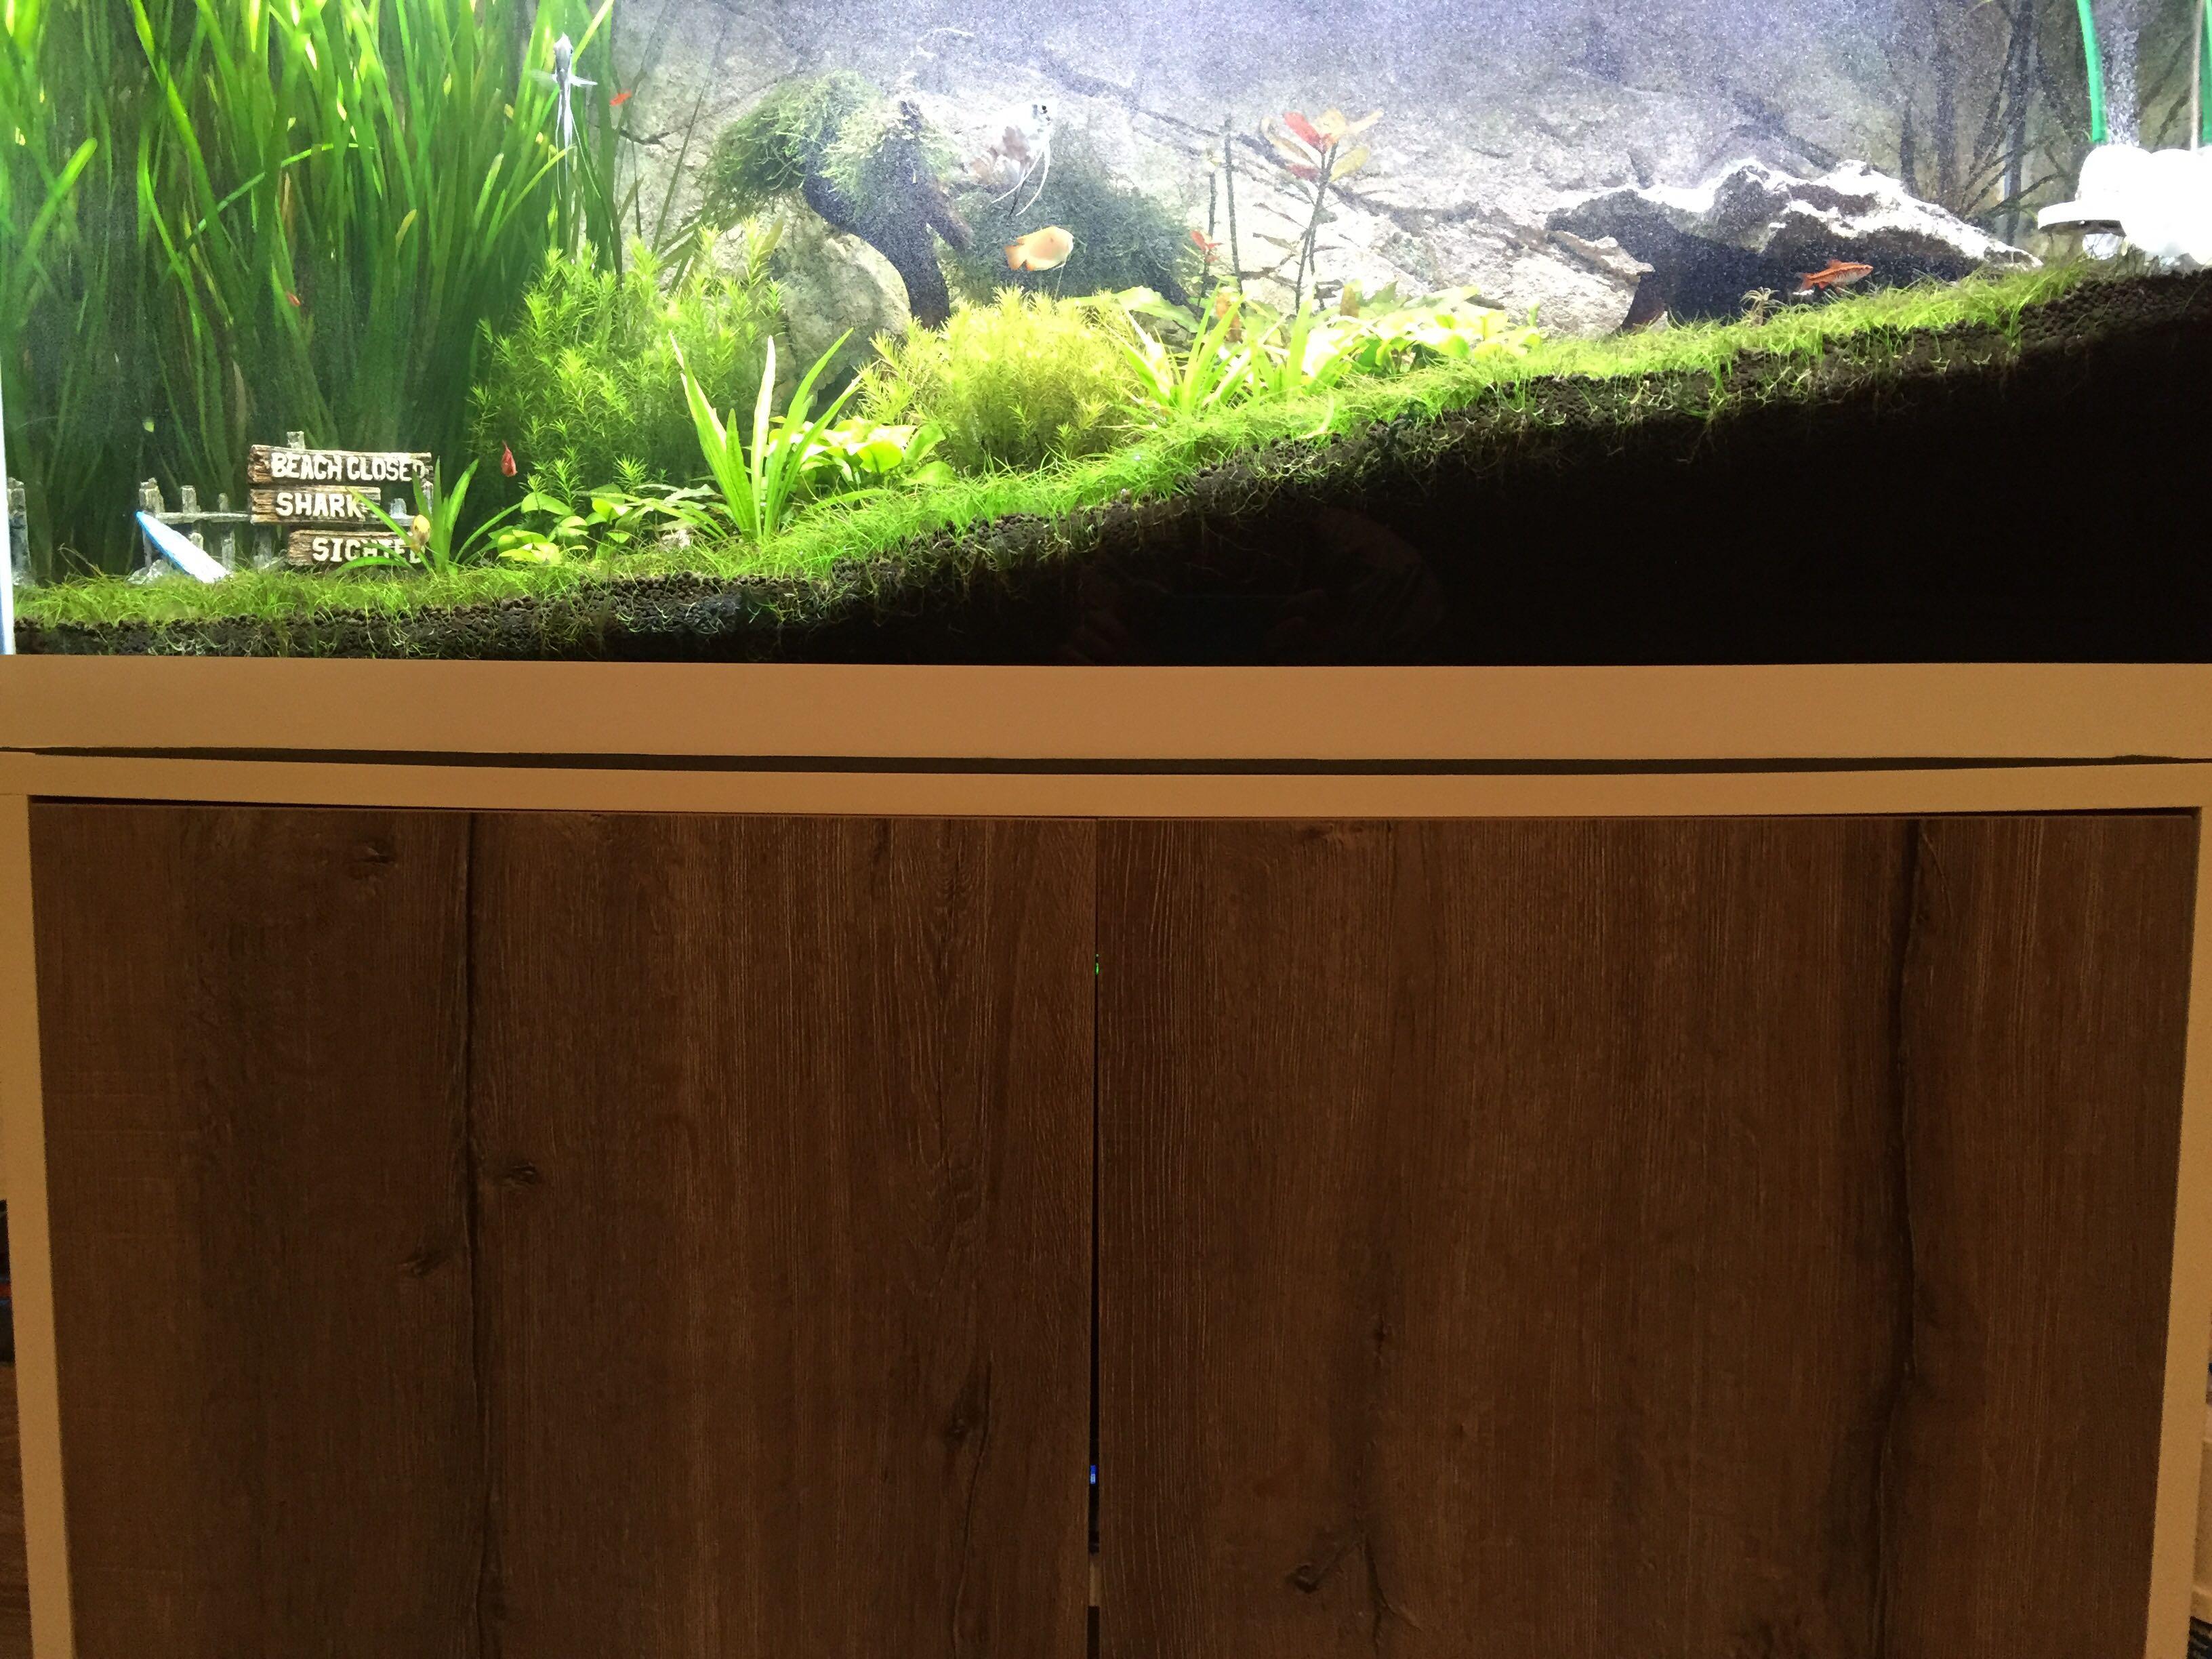 mein aquarium schrank h ngt durch sonstige technik. Black Bedroom Furniture Sets. Home Design Ideas